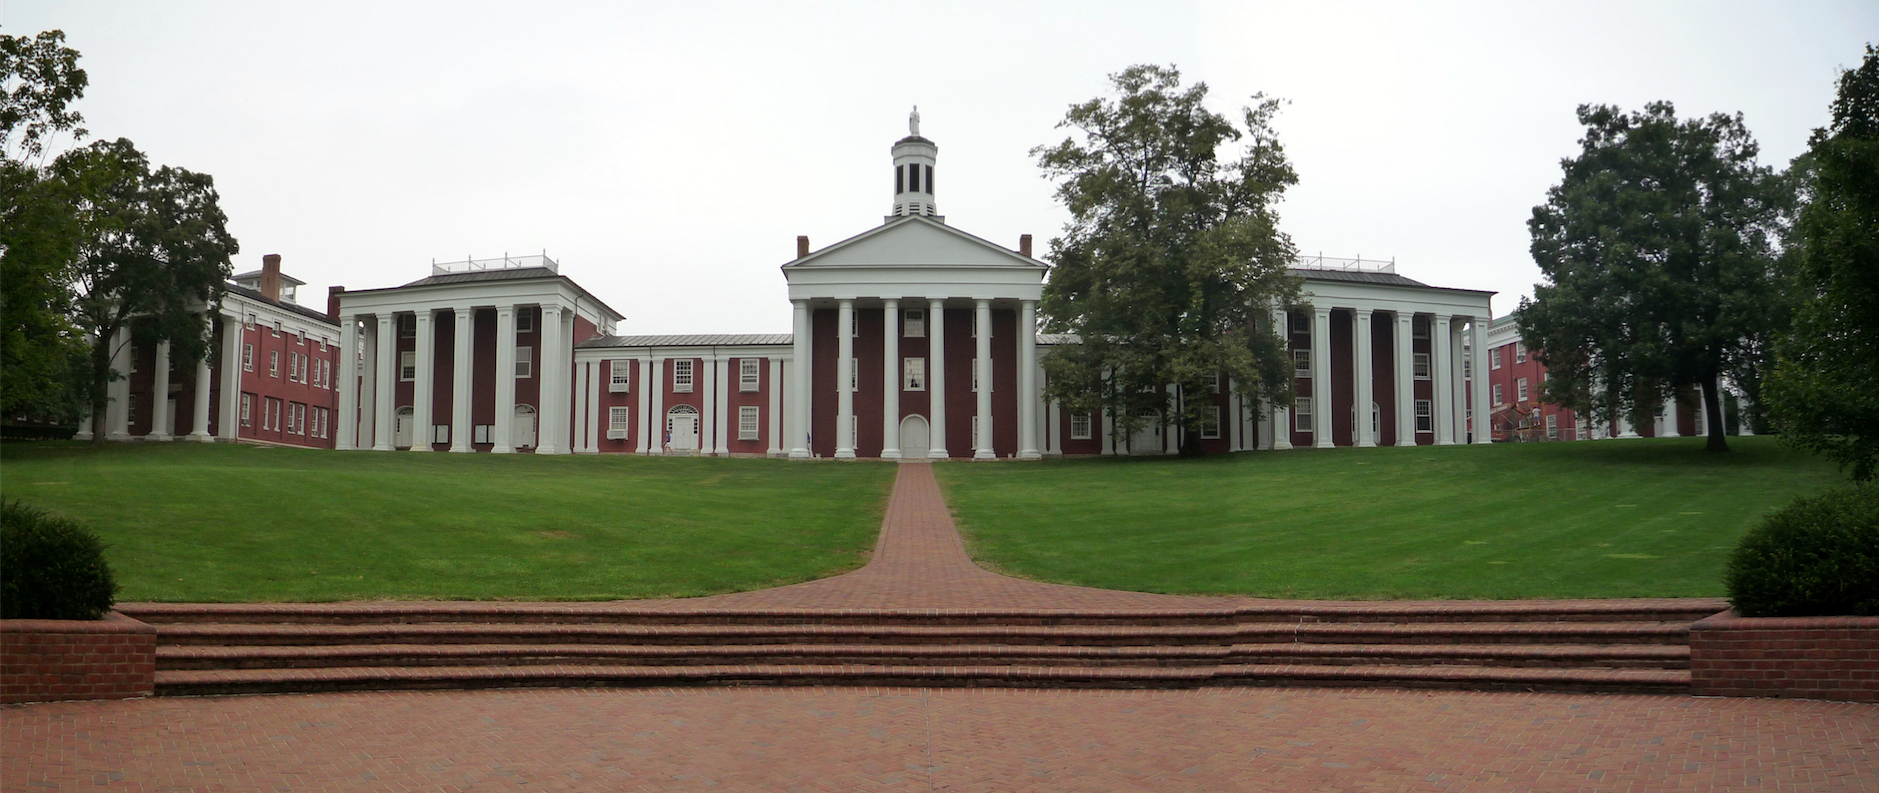 Iconic buildings at Washington and Lee University.